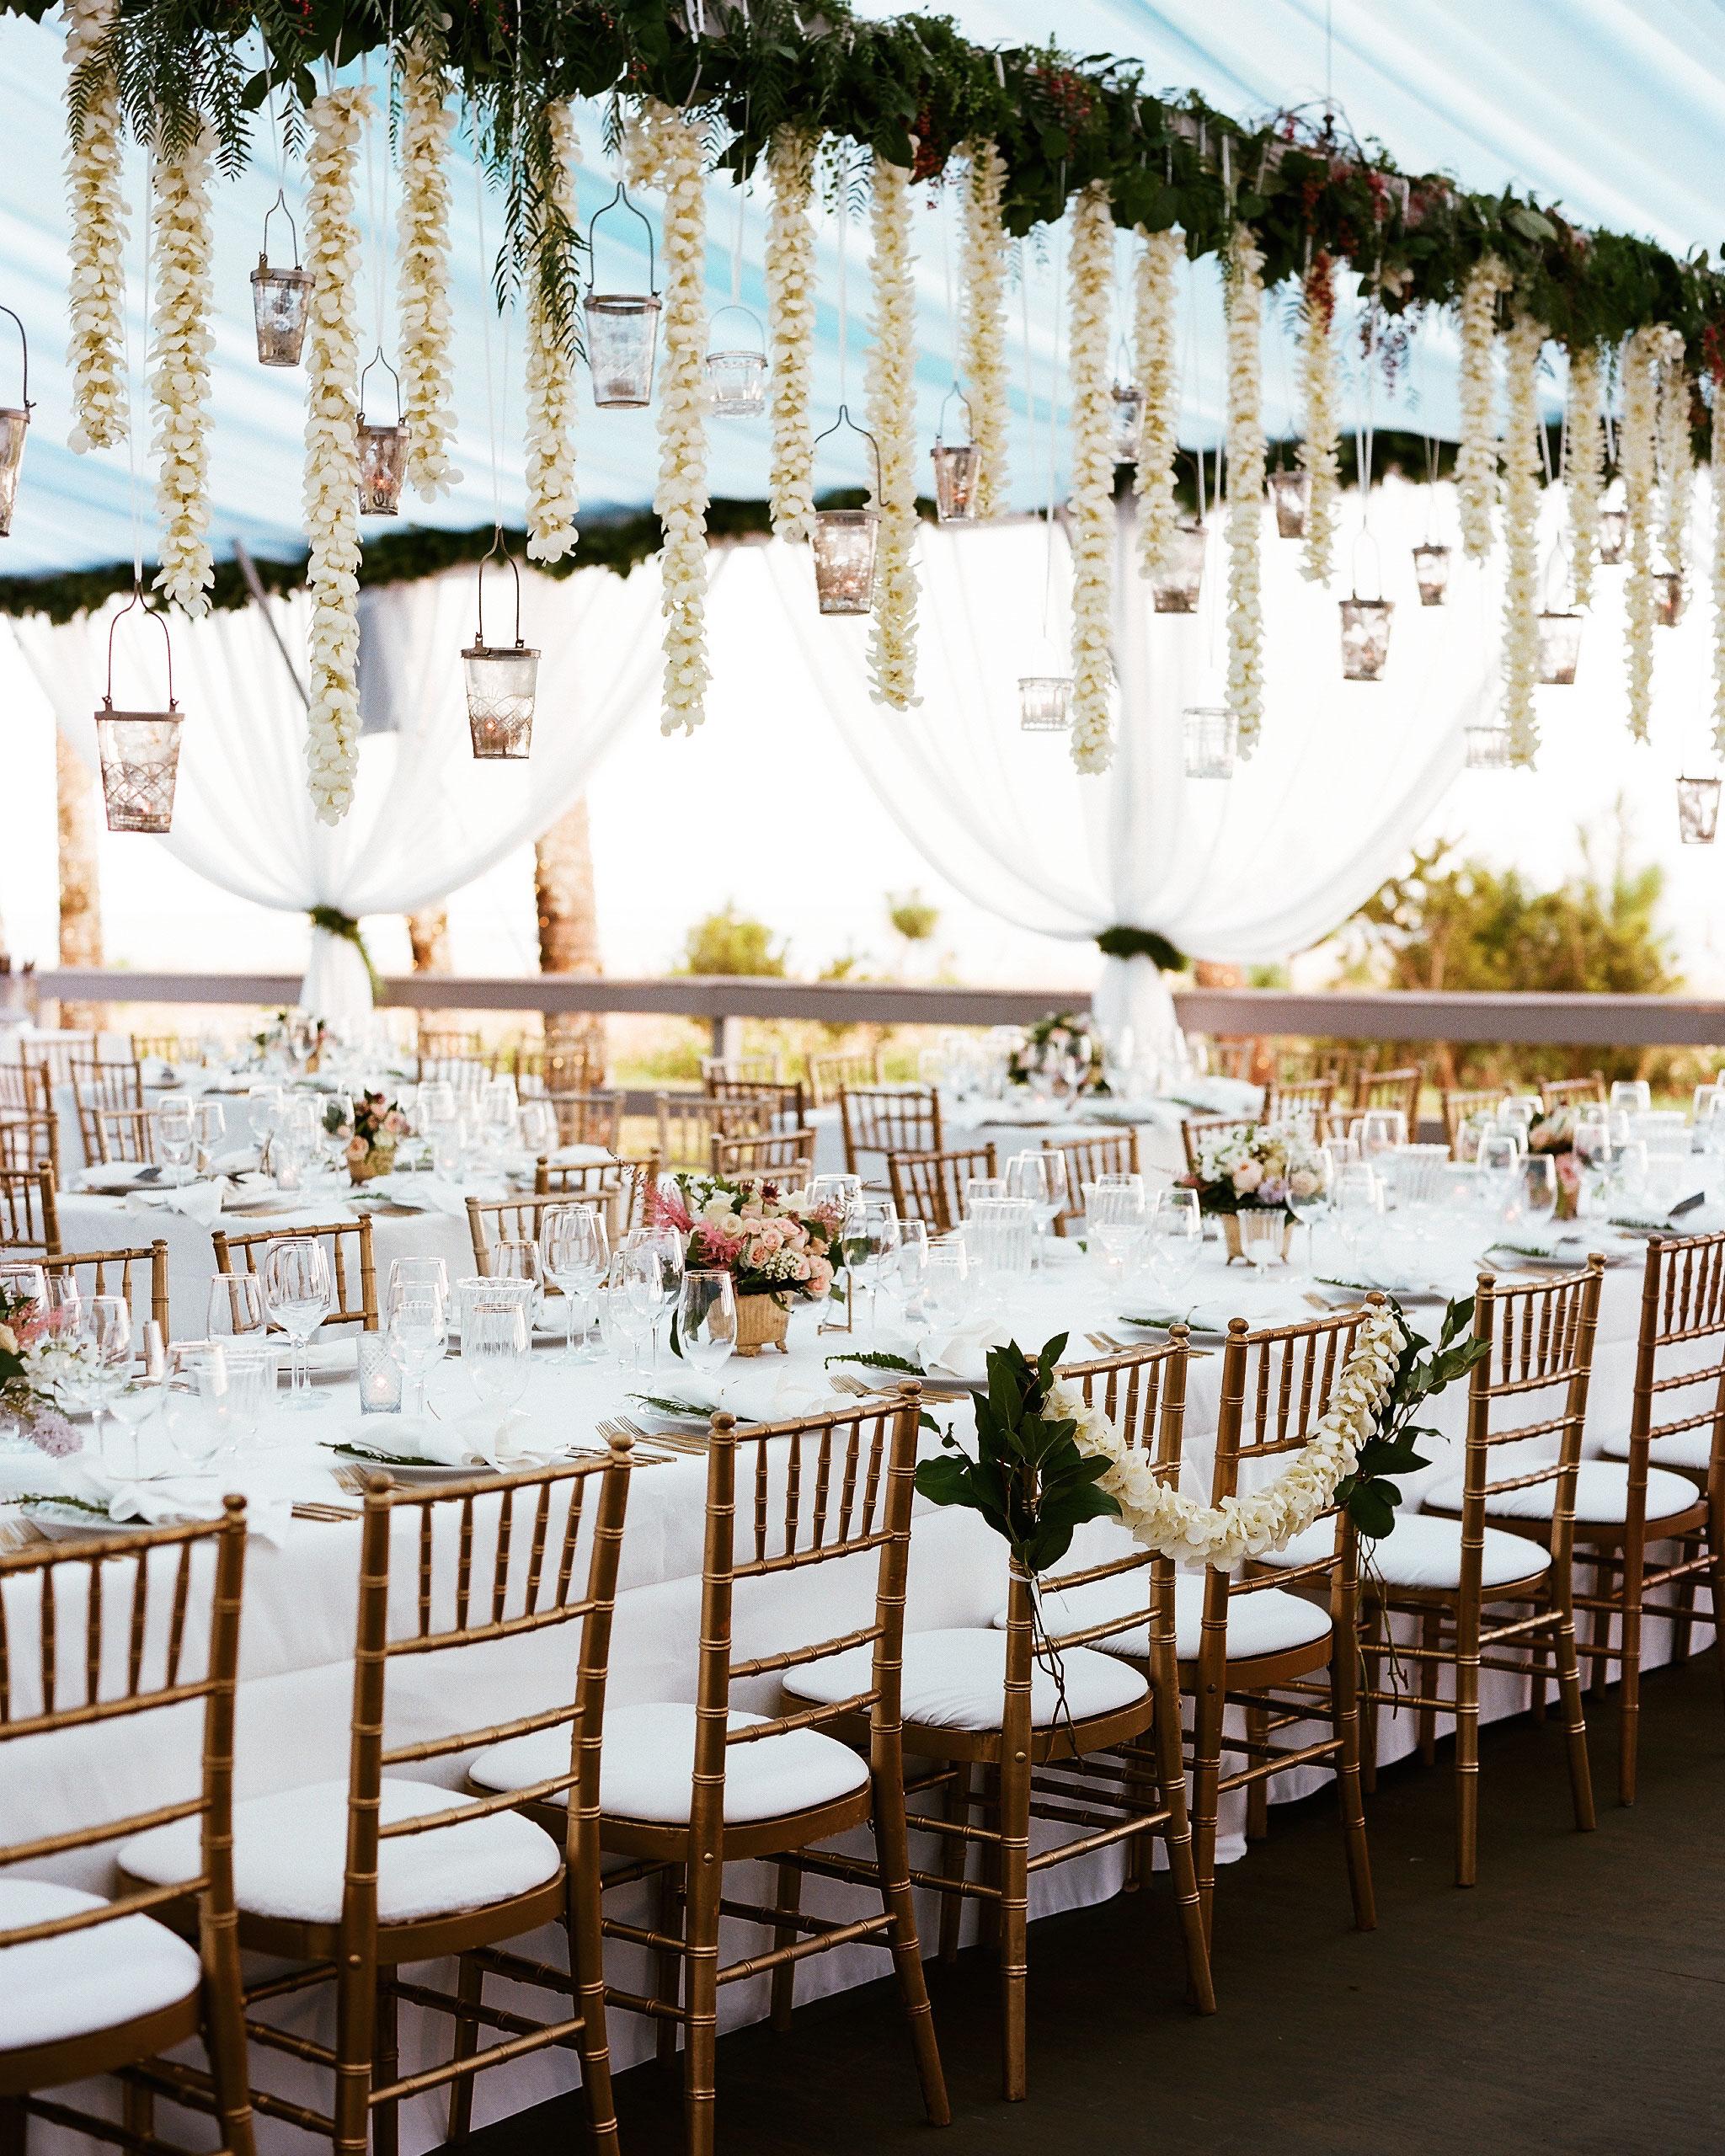 nancy-nathan-wedding-tent-0910-6141569-0816.jpg